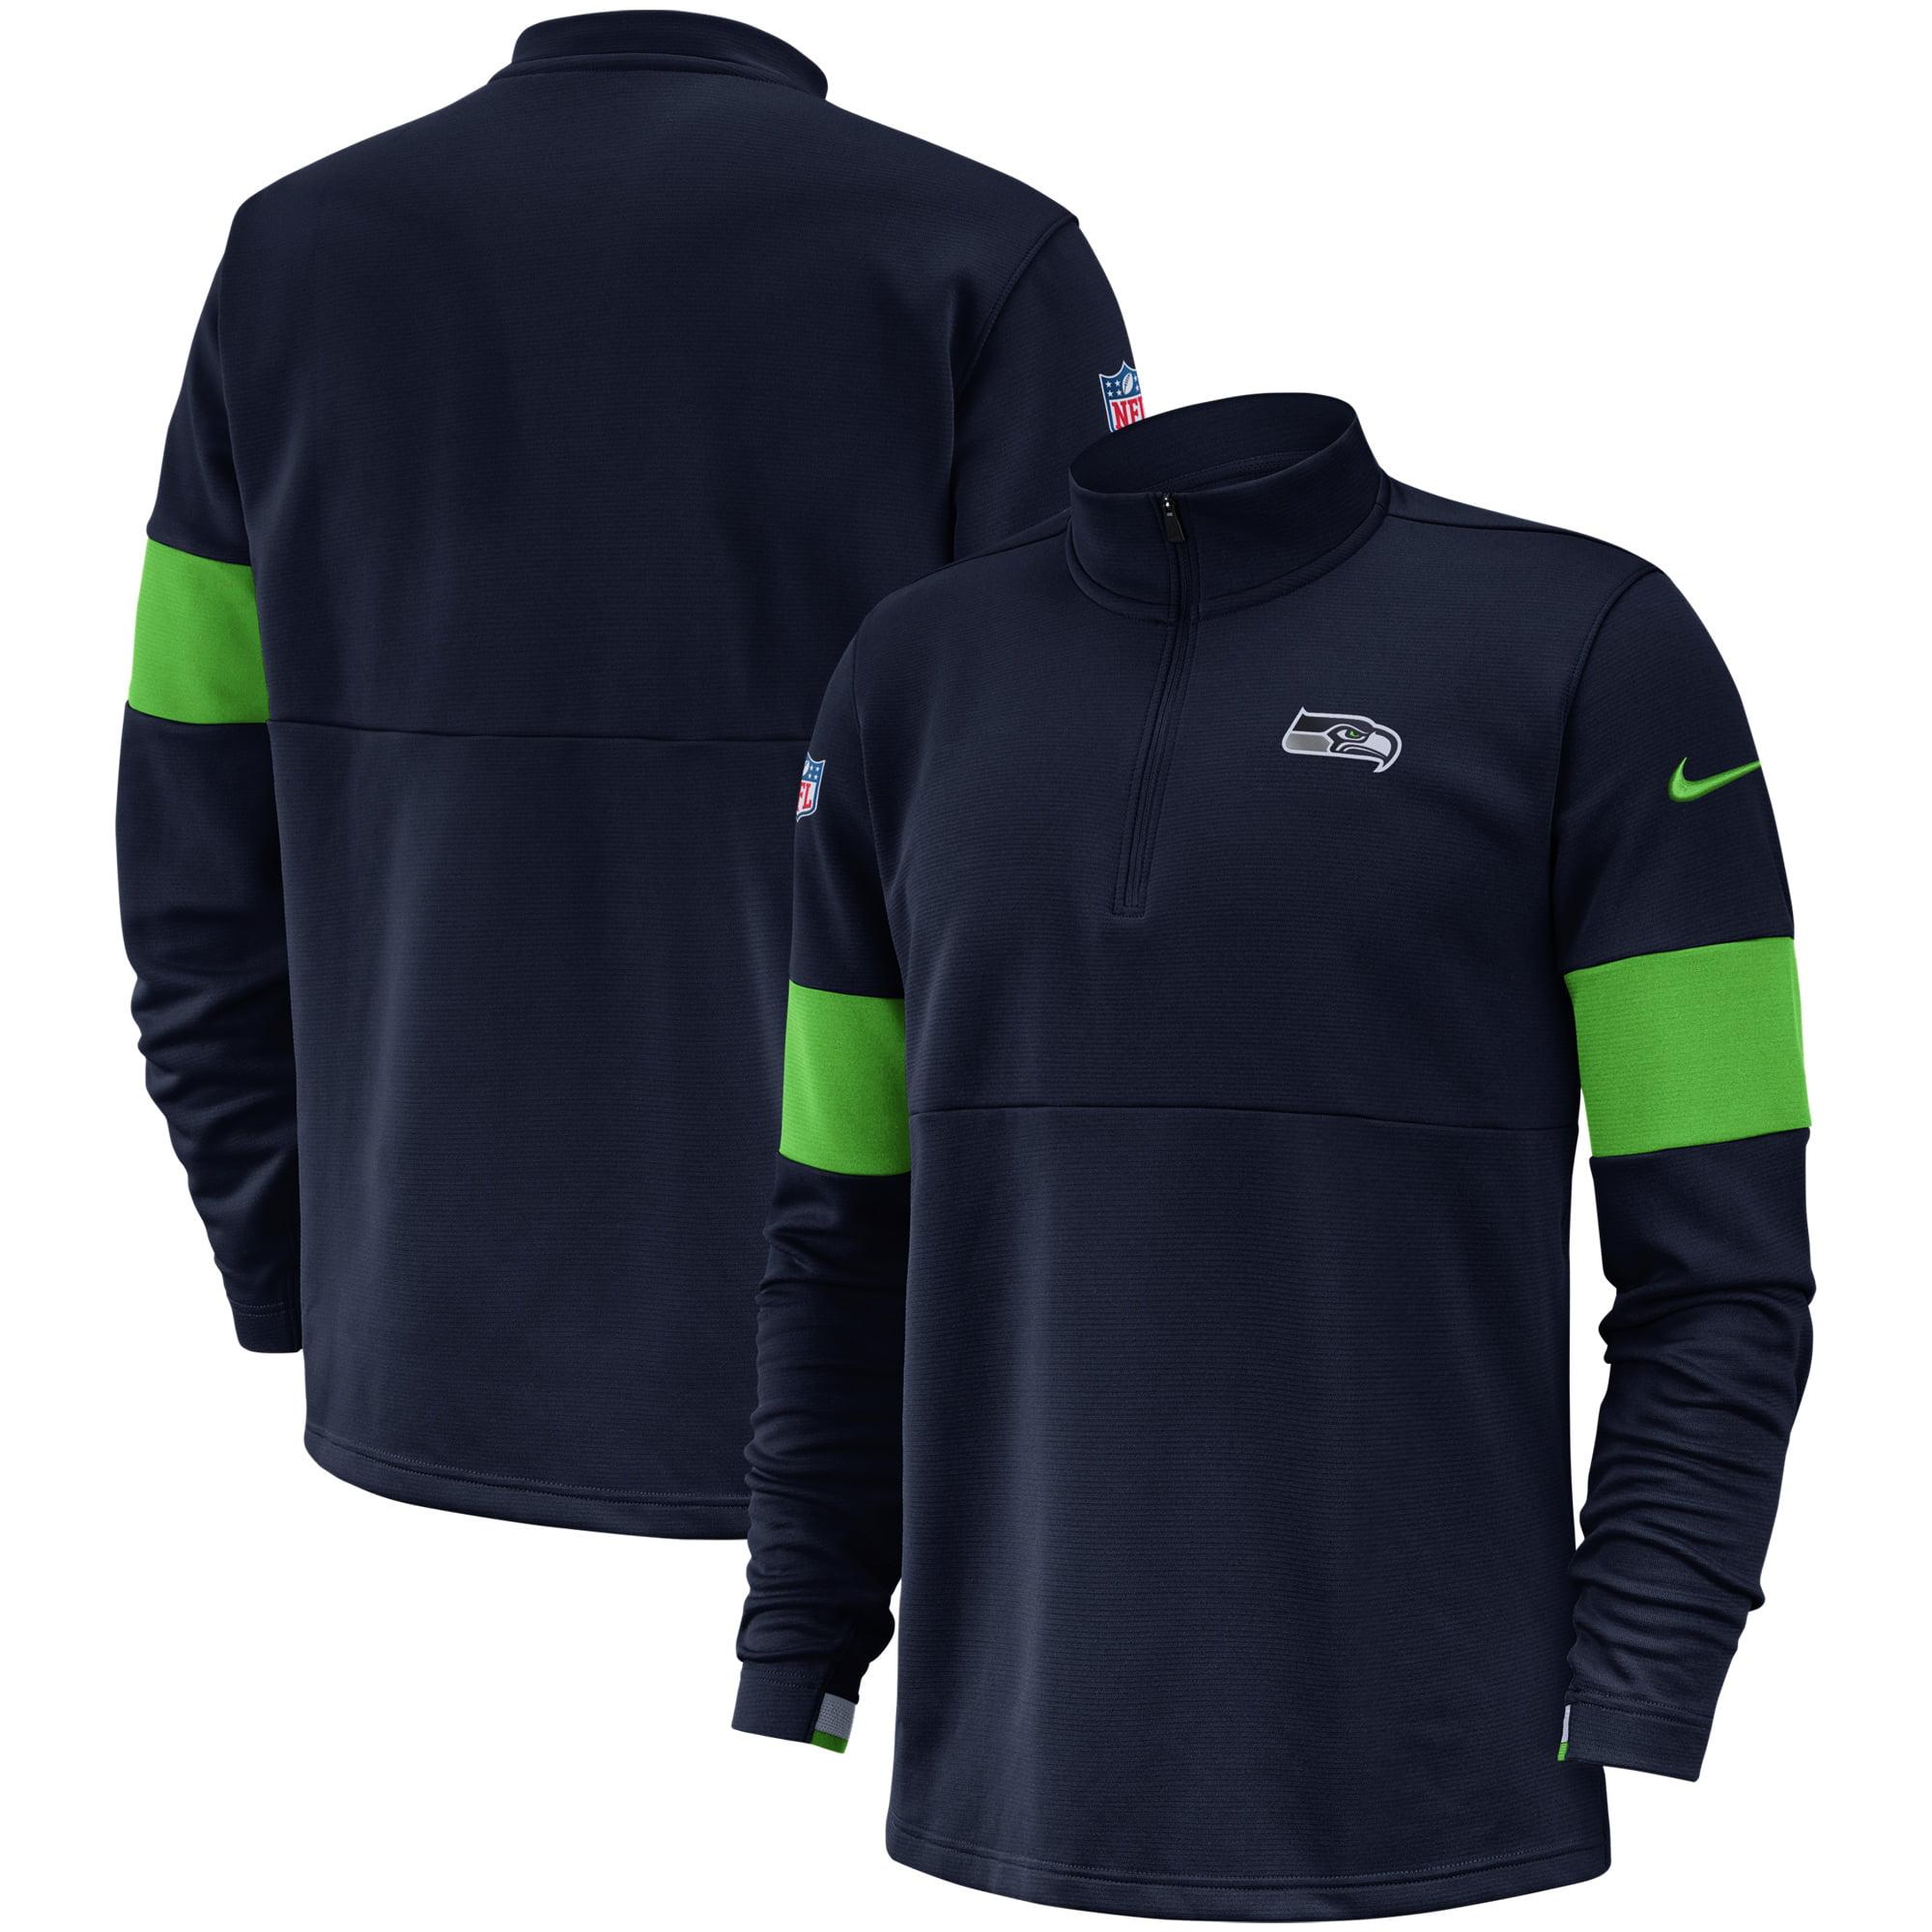 Seattle Seahawks Nike Sideline Performance Half-Zip Pullover Jacket - College Navy - Walmart.com - Walmart.com